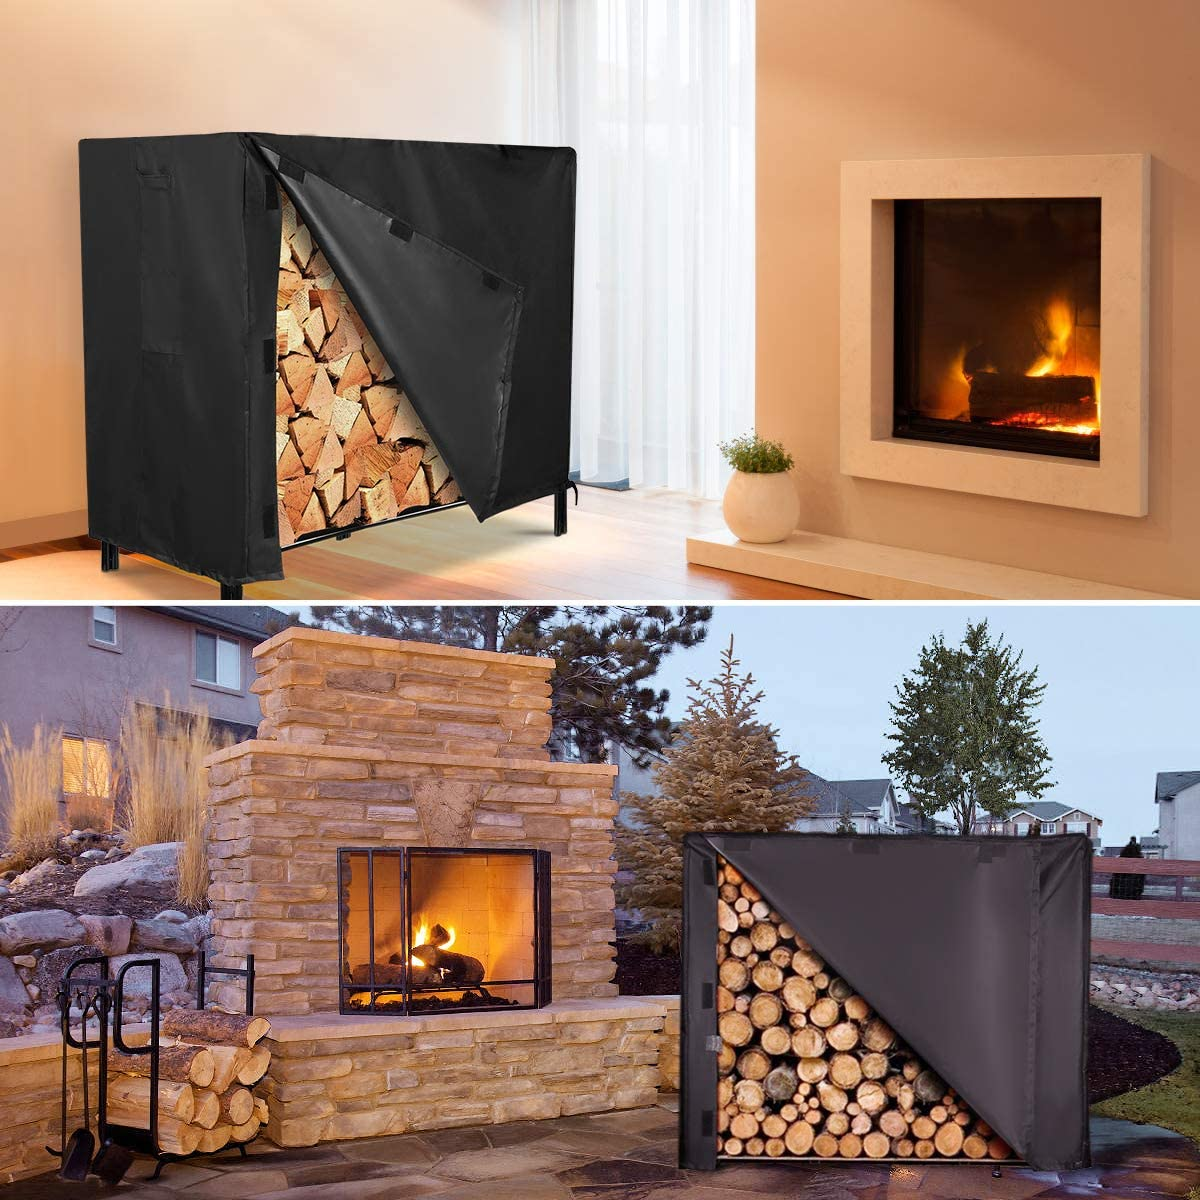 48x24x42in//122x61x107cm 4 Feet 600D Waterproof Patio Log Rack Outdoor Cover NASUM Firewood Rack Cover